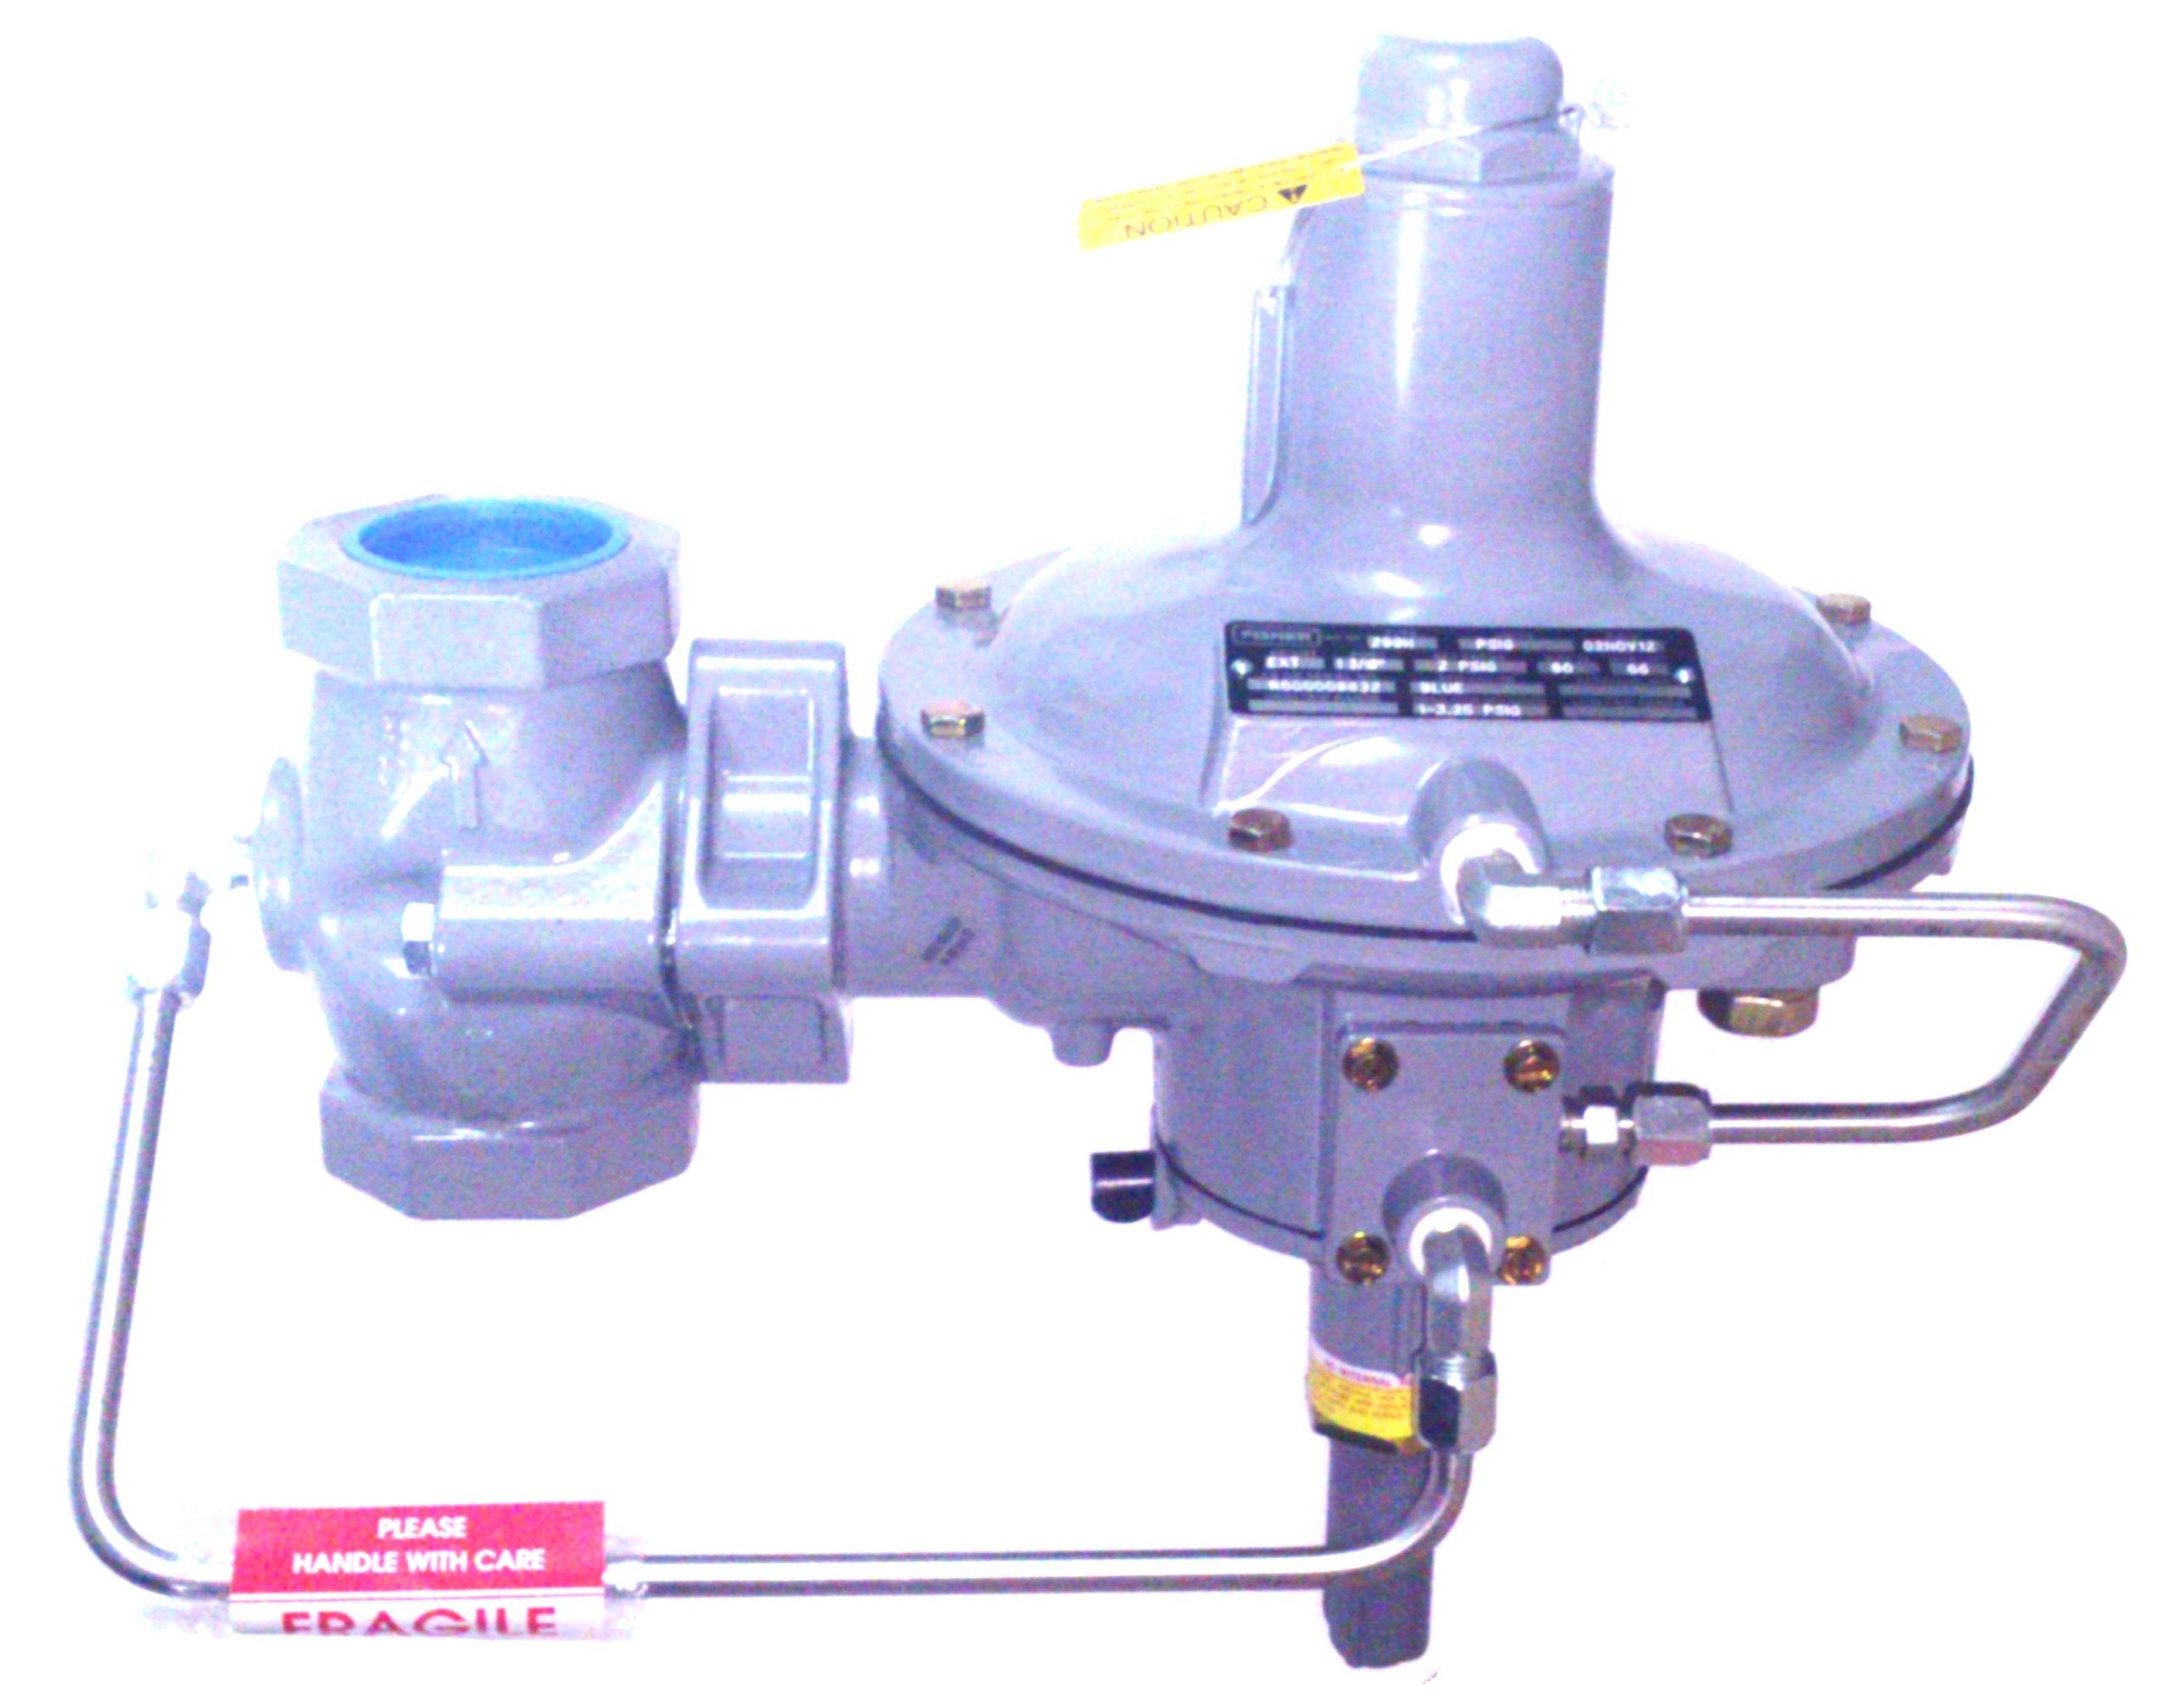 Reguladores serie 299h cicsa for Regulador de gas natural precio